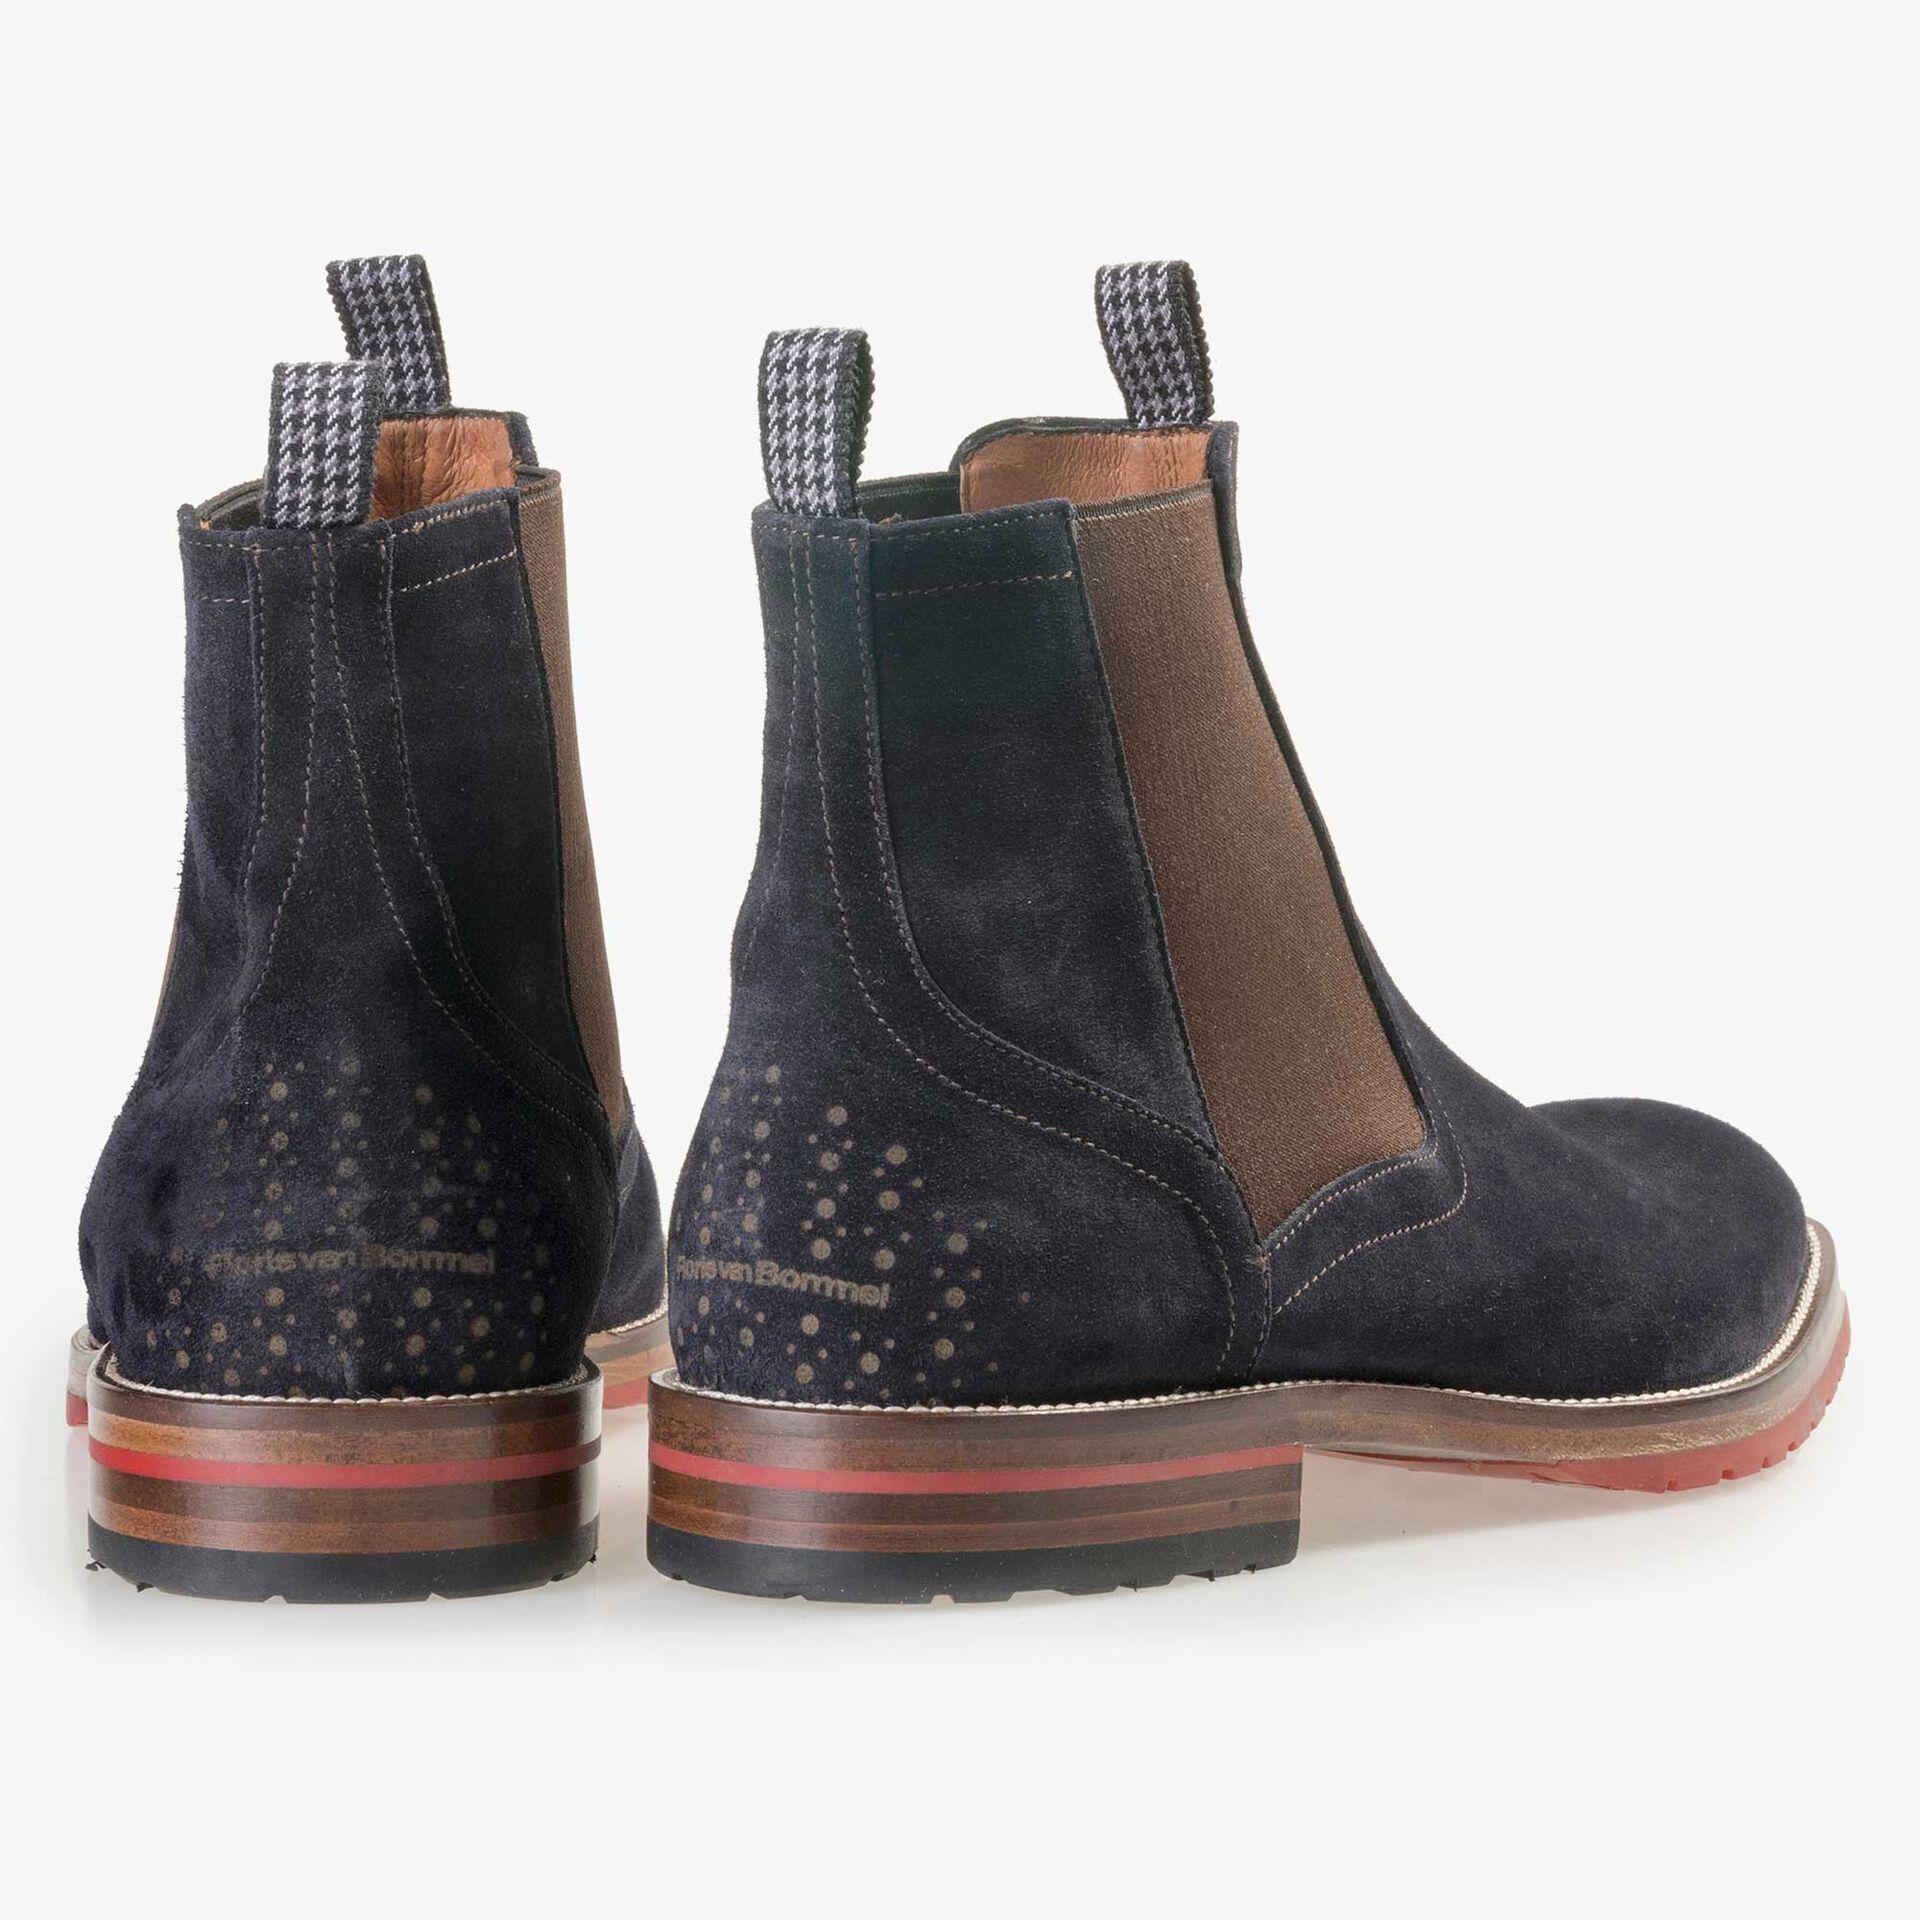 Floris van Bommel men's blue suede leather Chelsea boot